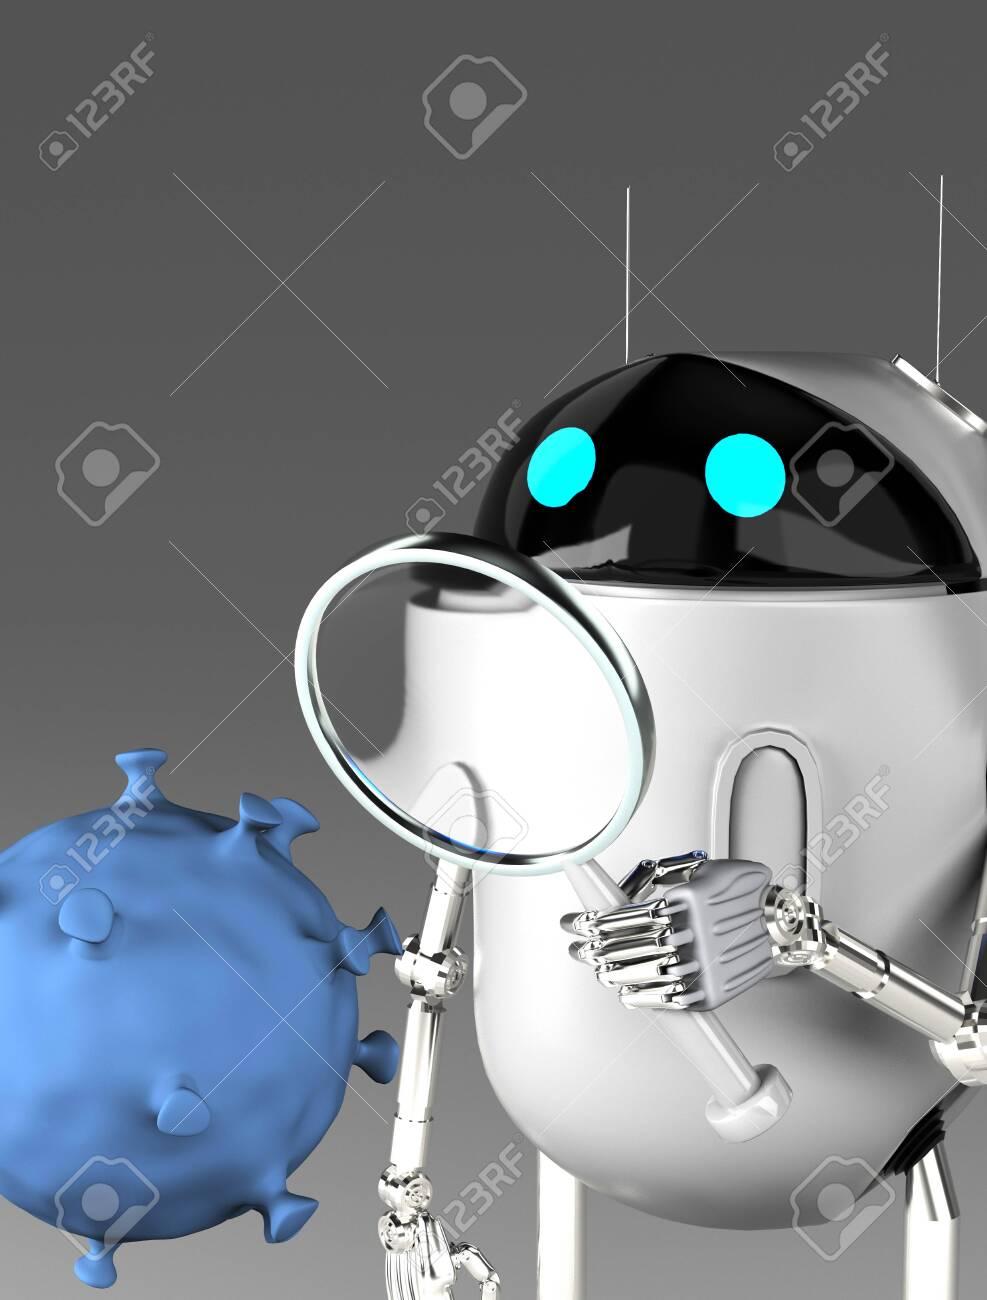 The robot studies a coronavirus with magnifier,robot with bacterium,3d render. - 139309803